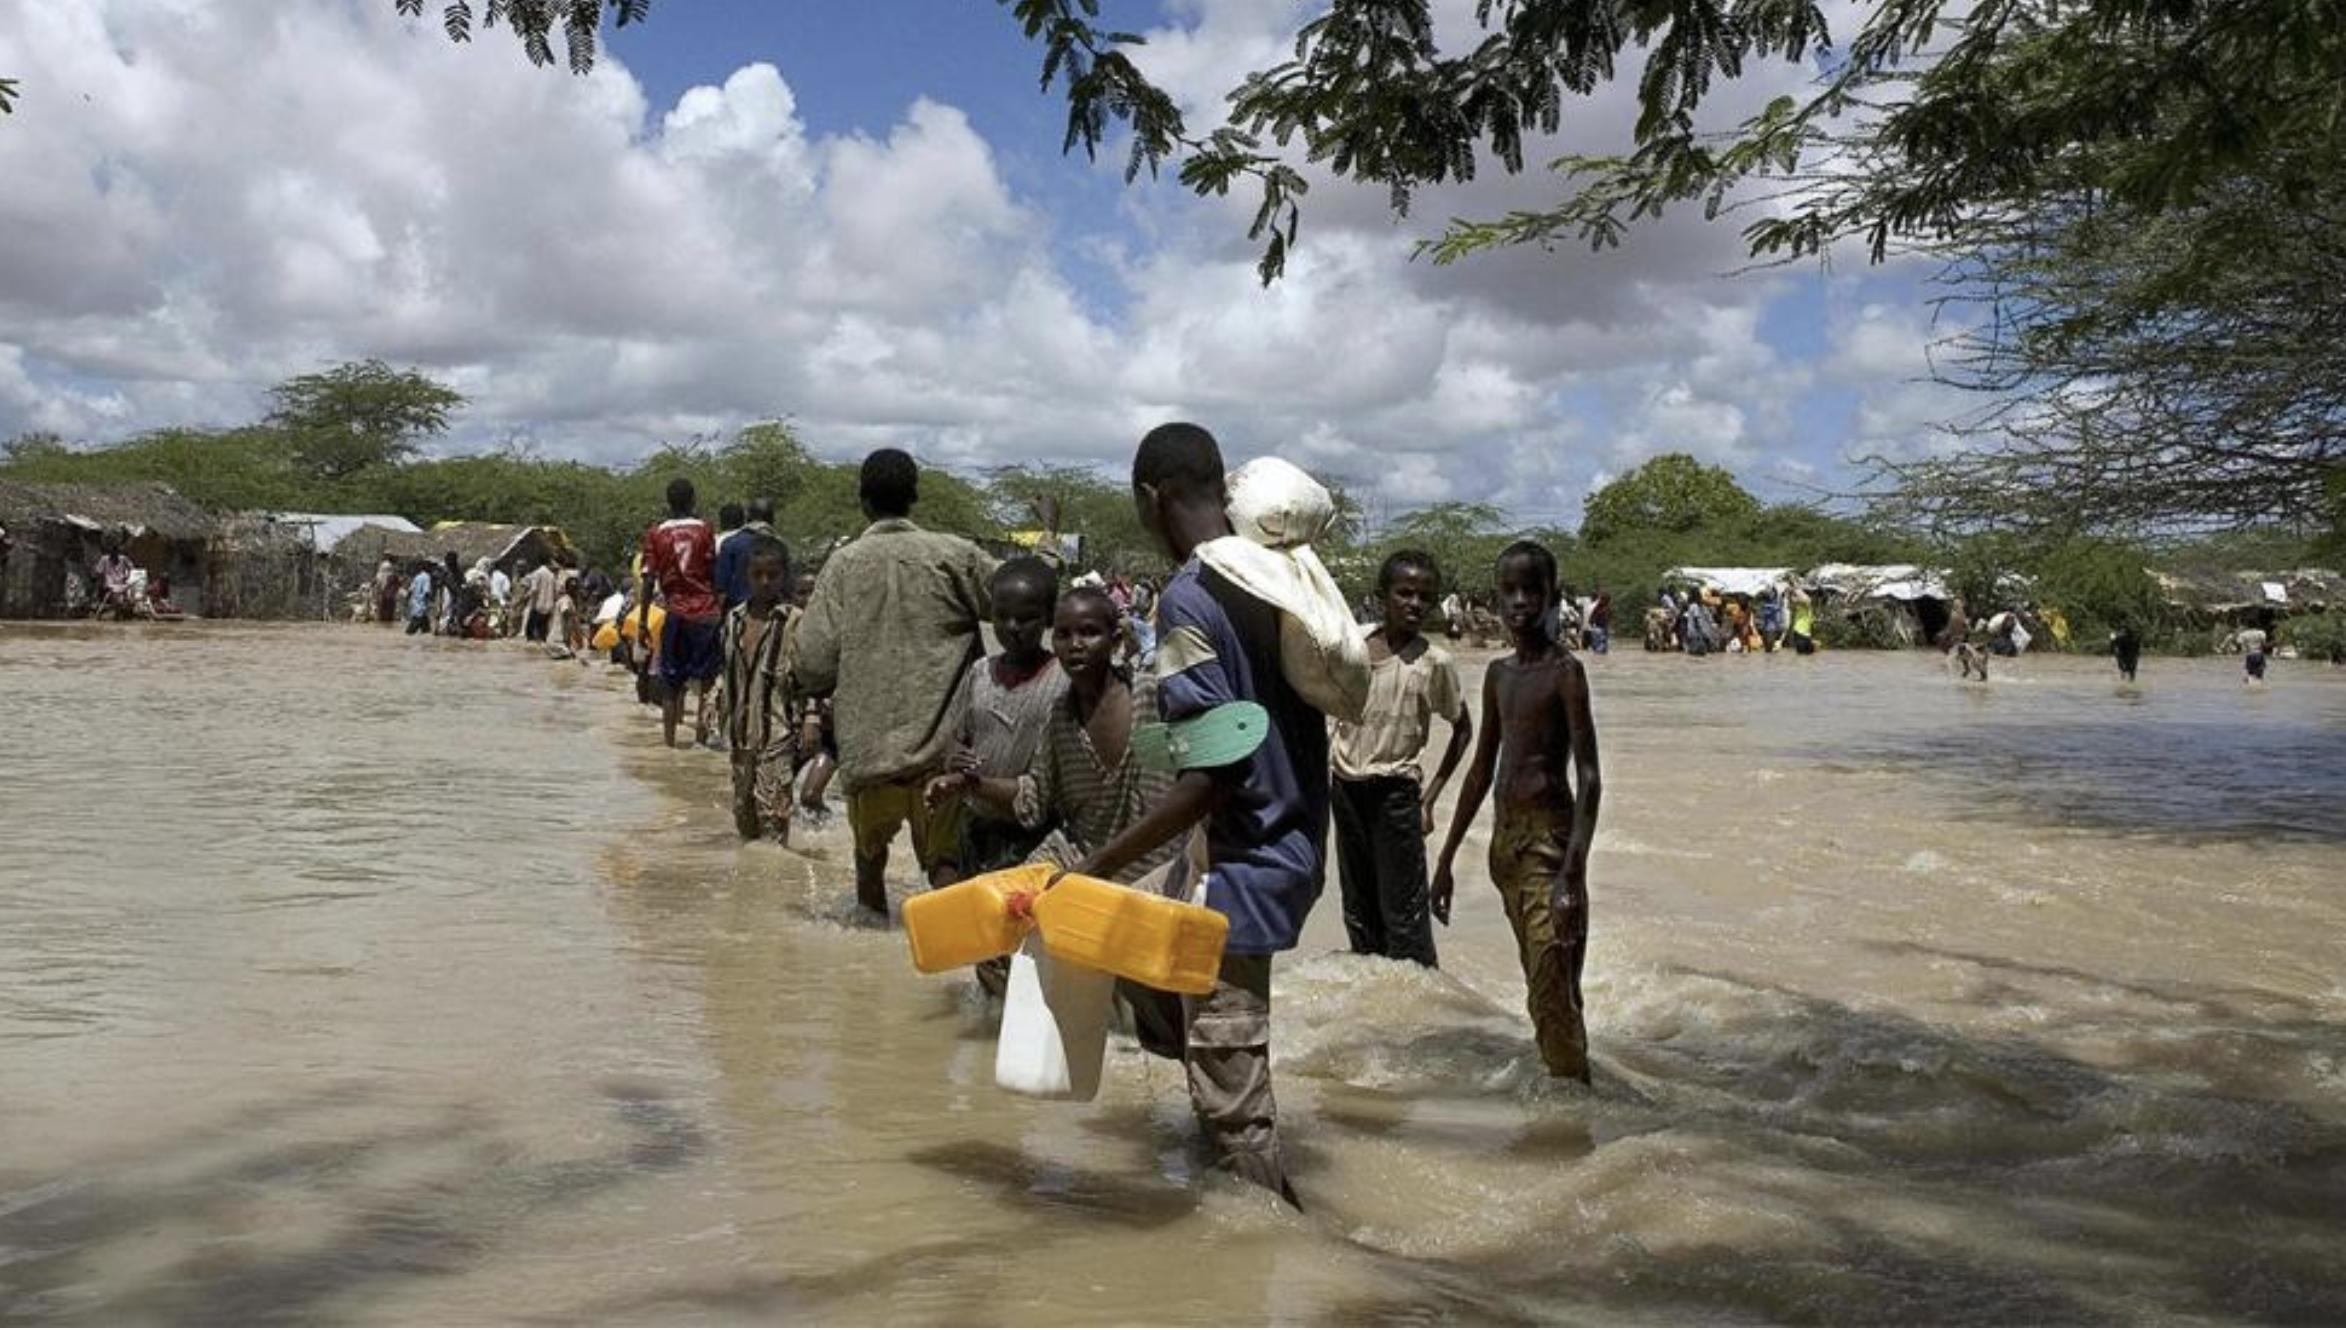 Somali refugees displaced by floods cross a swollen river in Dadaab, Garissa district in Kenya's arid northeastern province 22, November 2006.